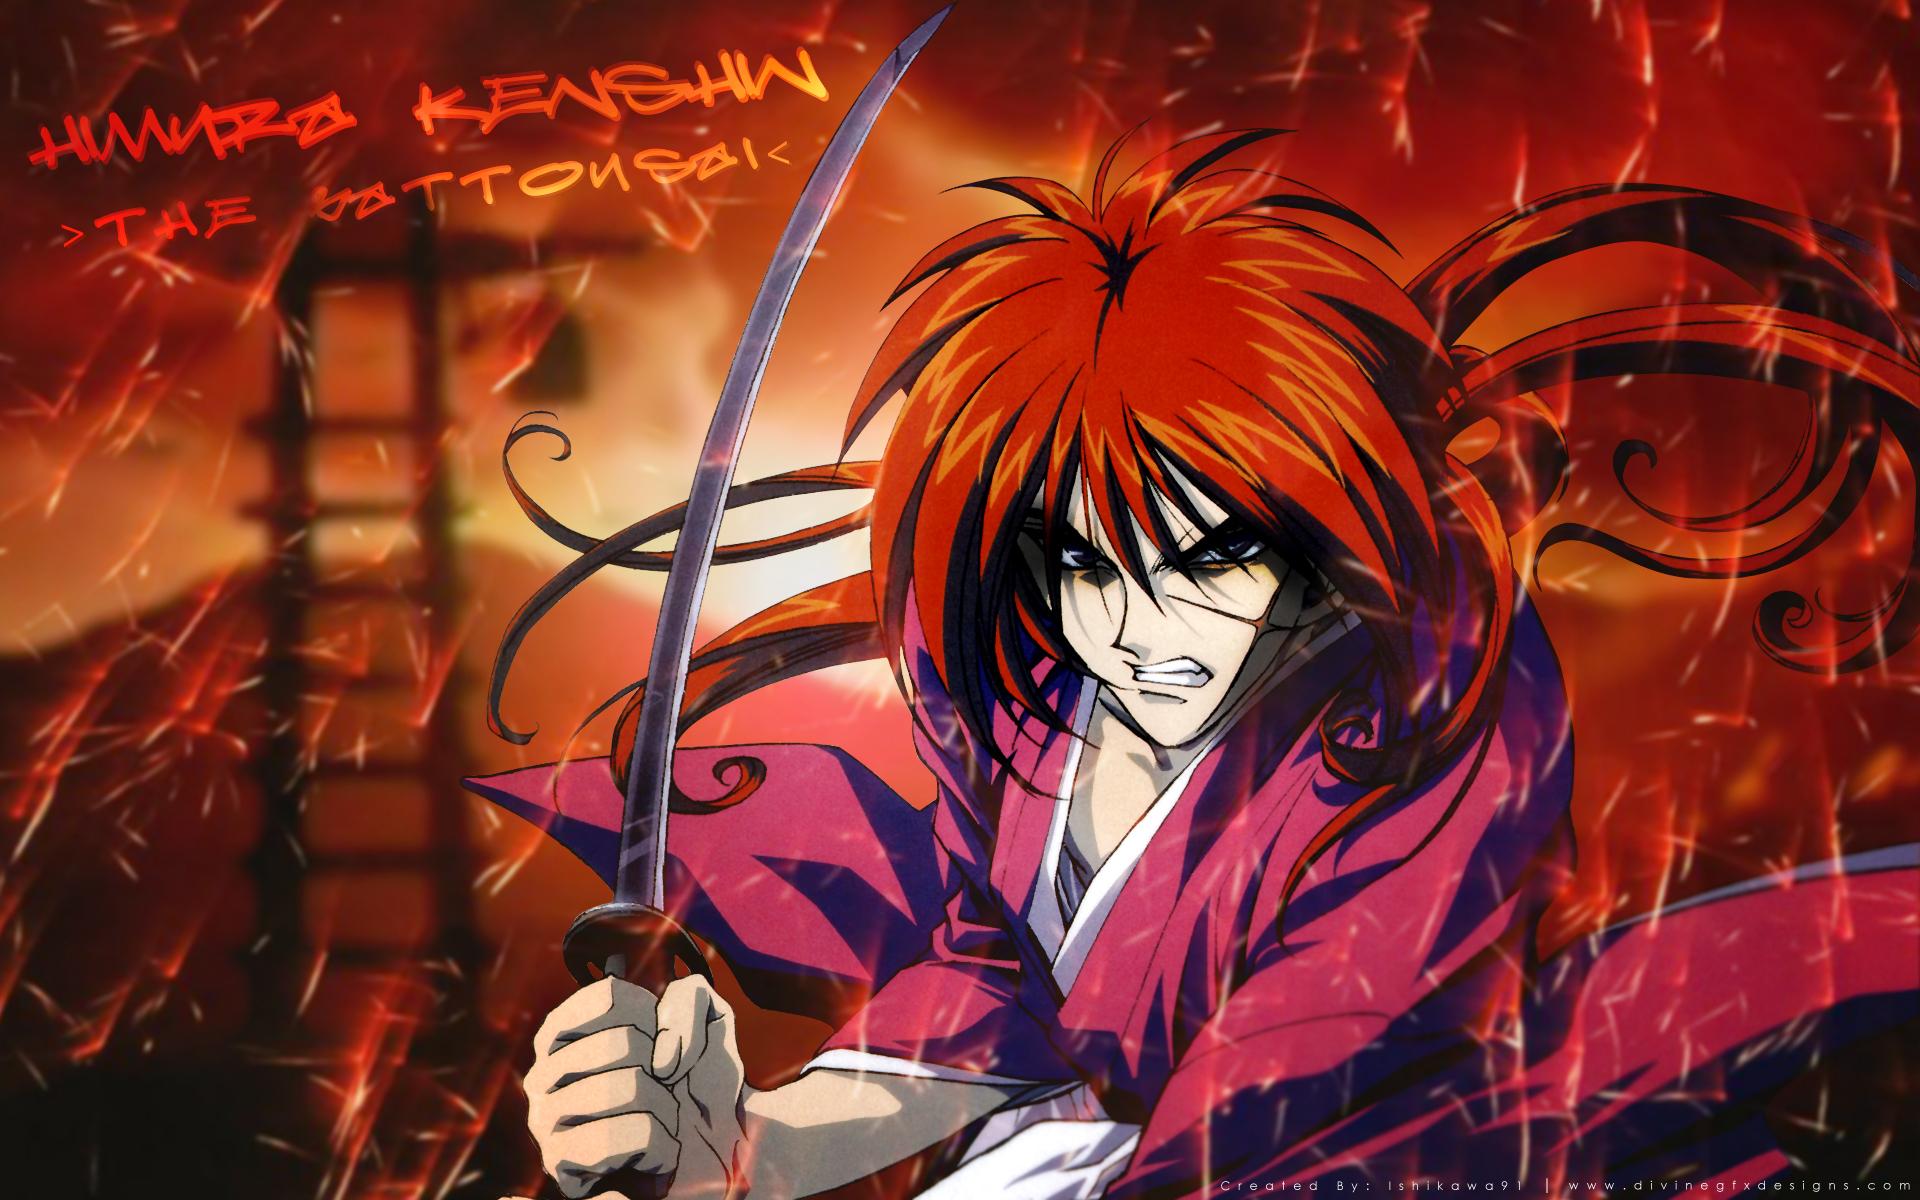 Rurouni kenshin full hd wallpaper and background image 1920x1200 anime rurouni kenshin wallpaper voltagebd Gallery